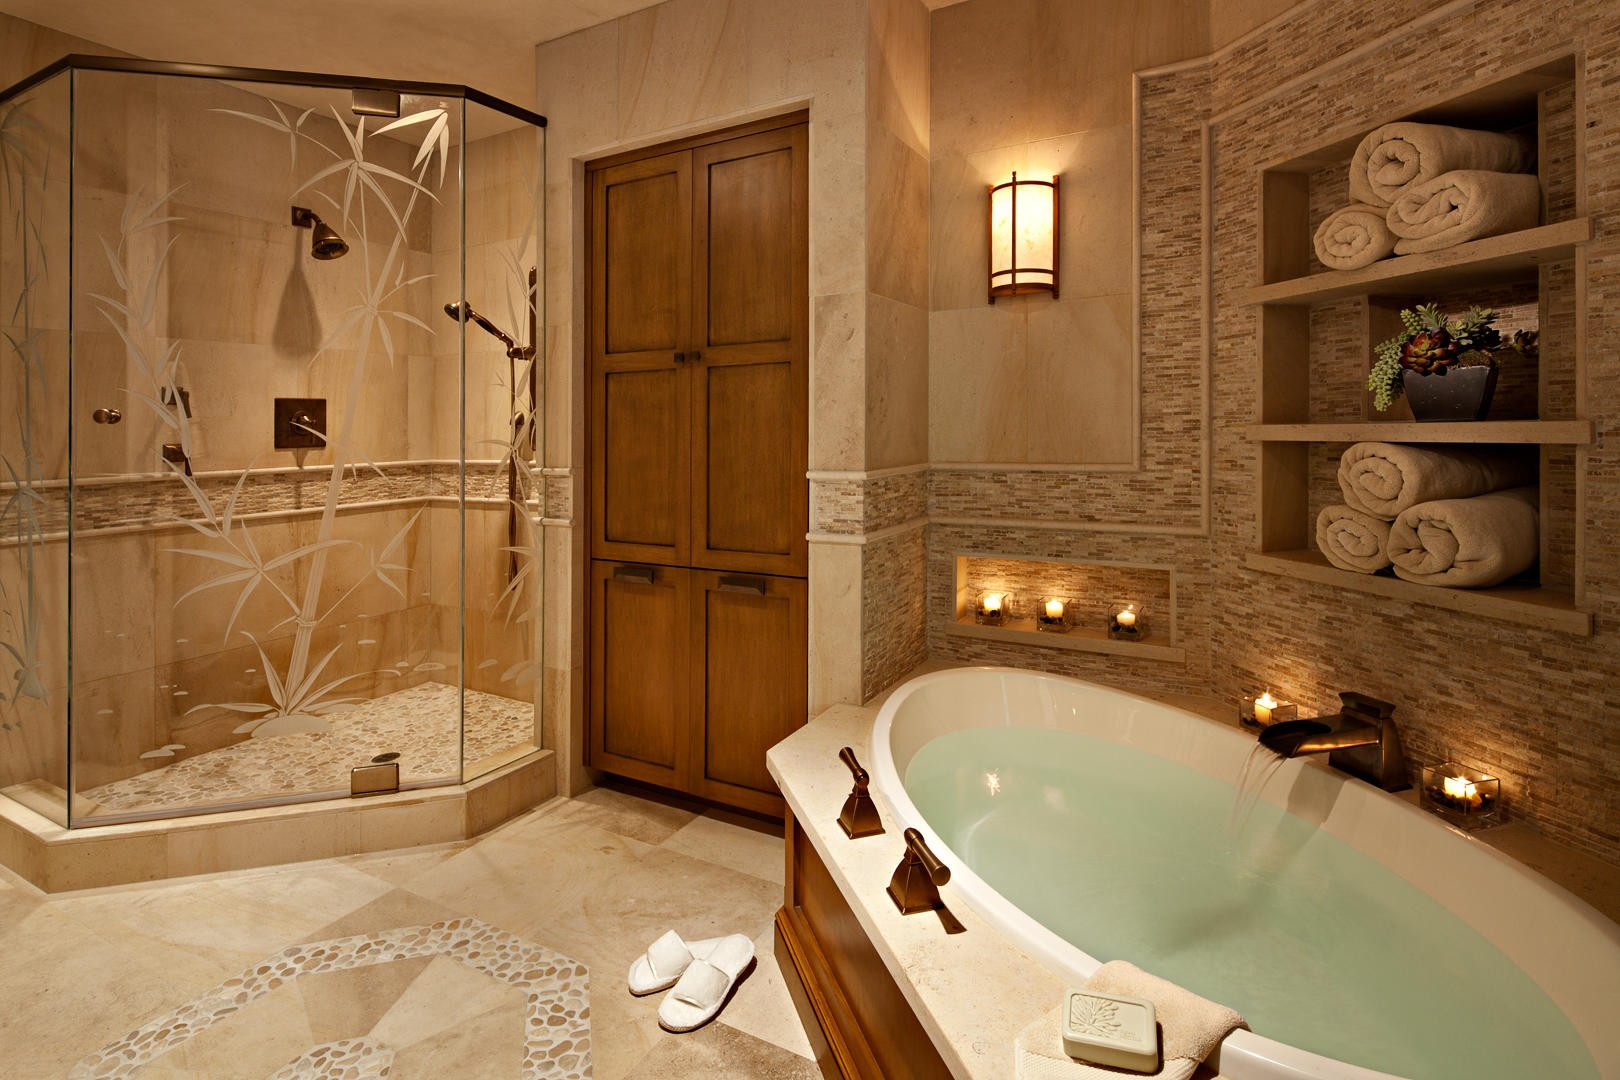 spa bathroom shower ideas photo - 1